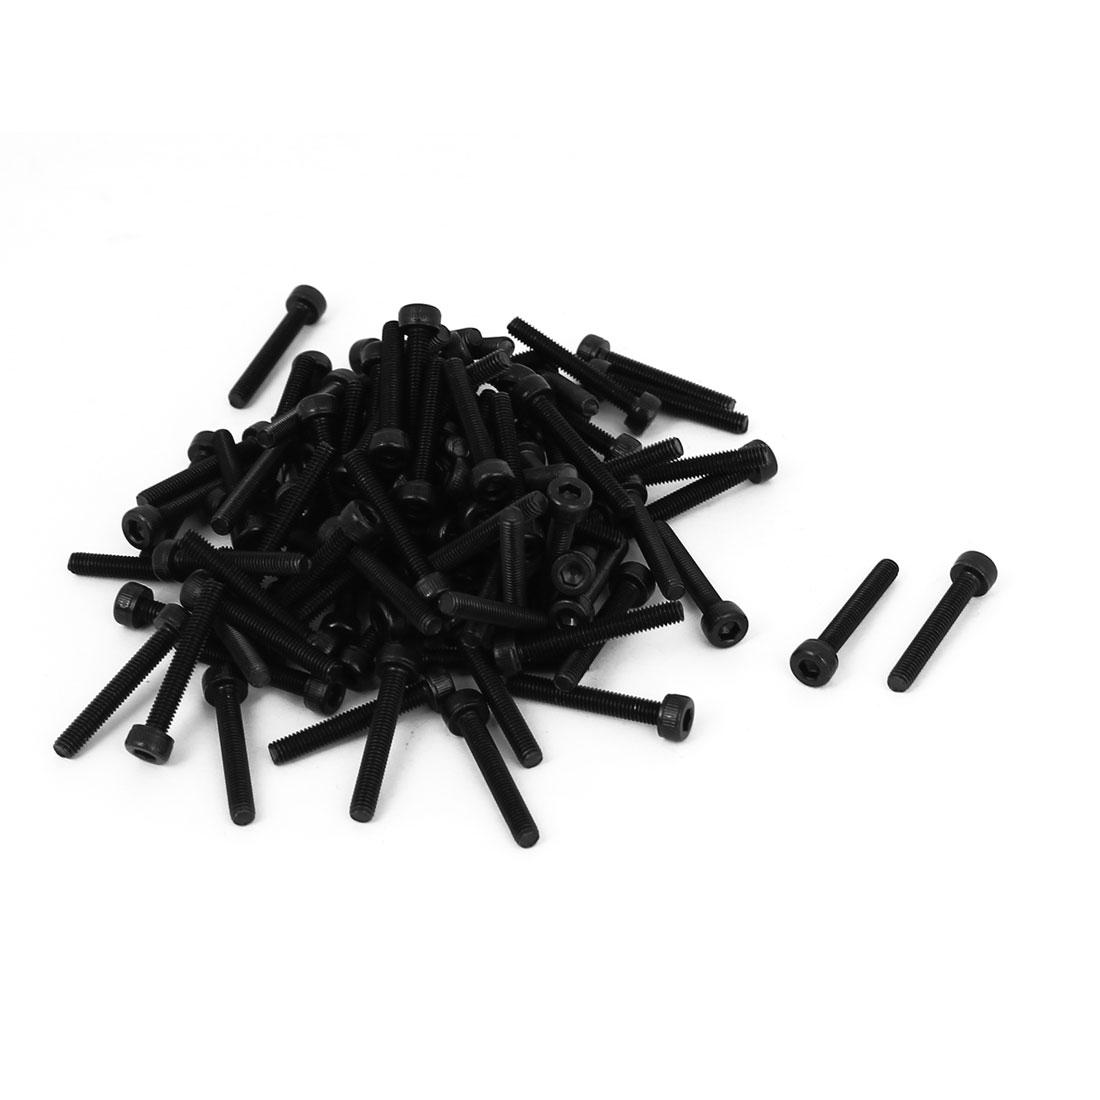 100Pcs M3x20mm 12.9 Alloy Steel Screw Cap Point Hex Socket Screws Bolts